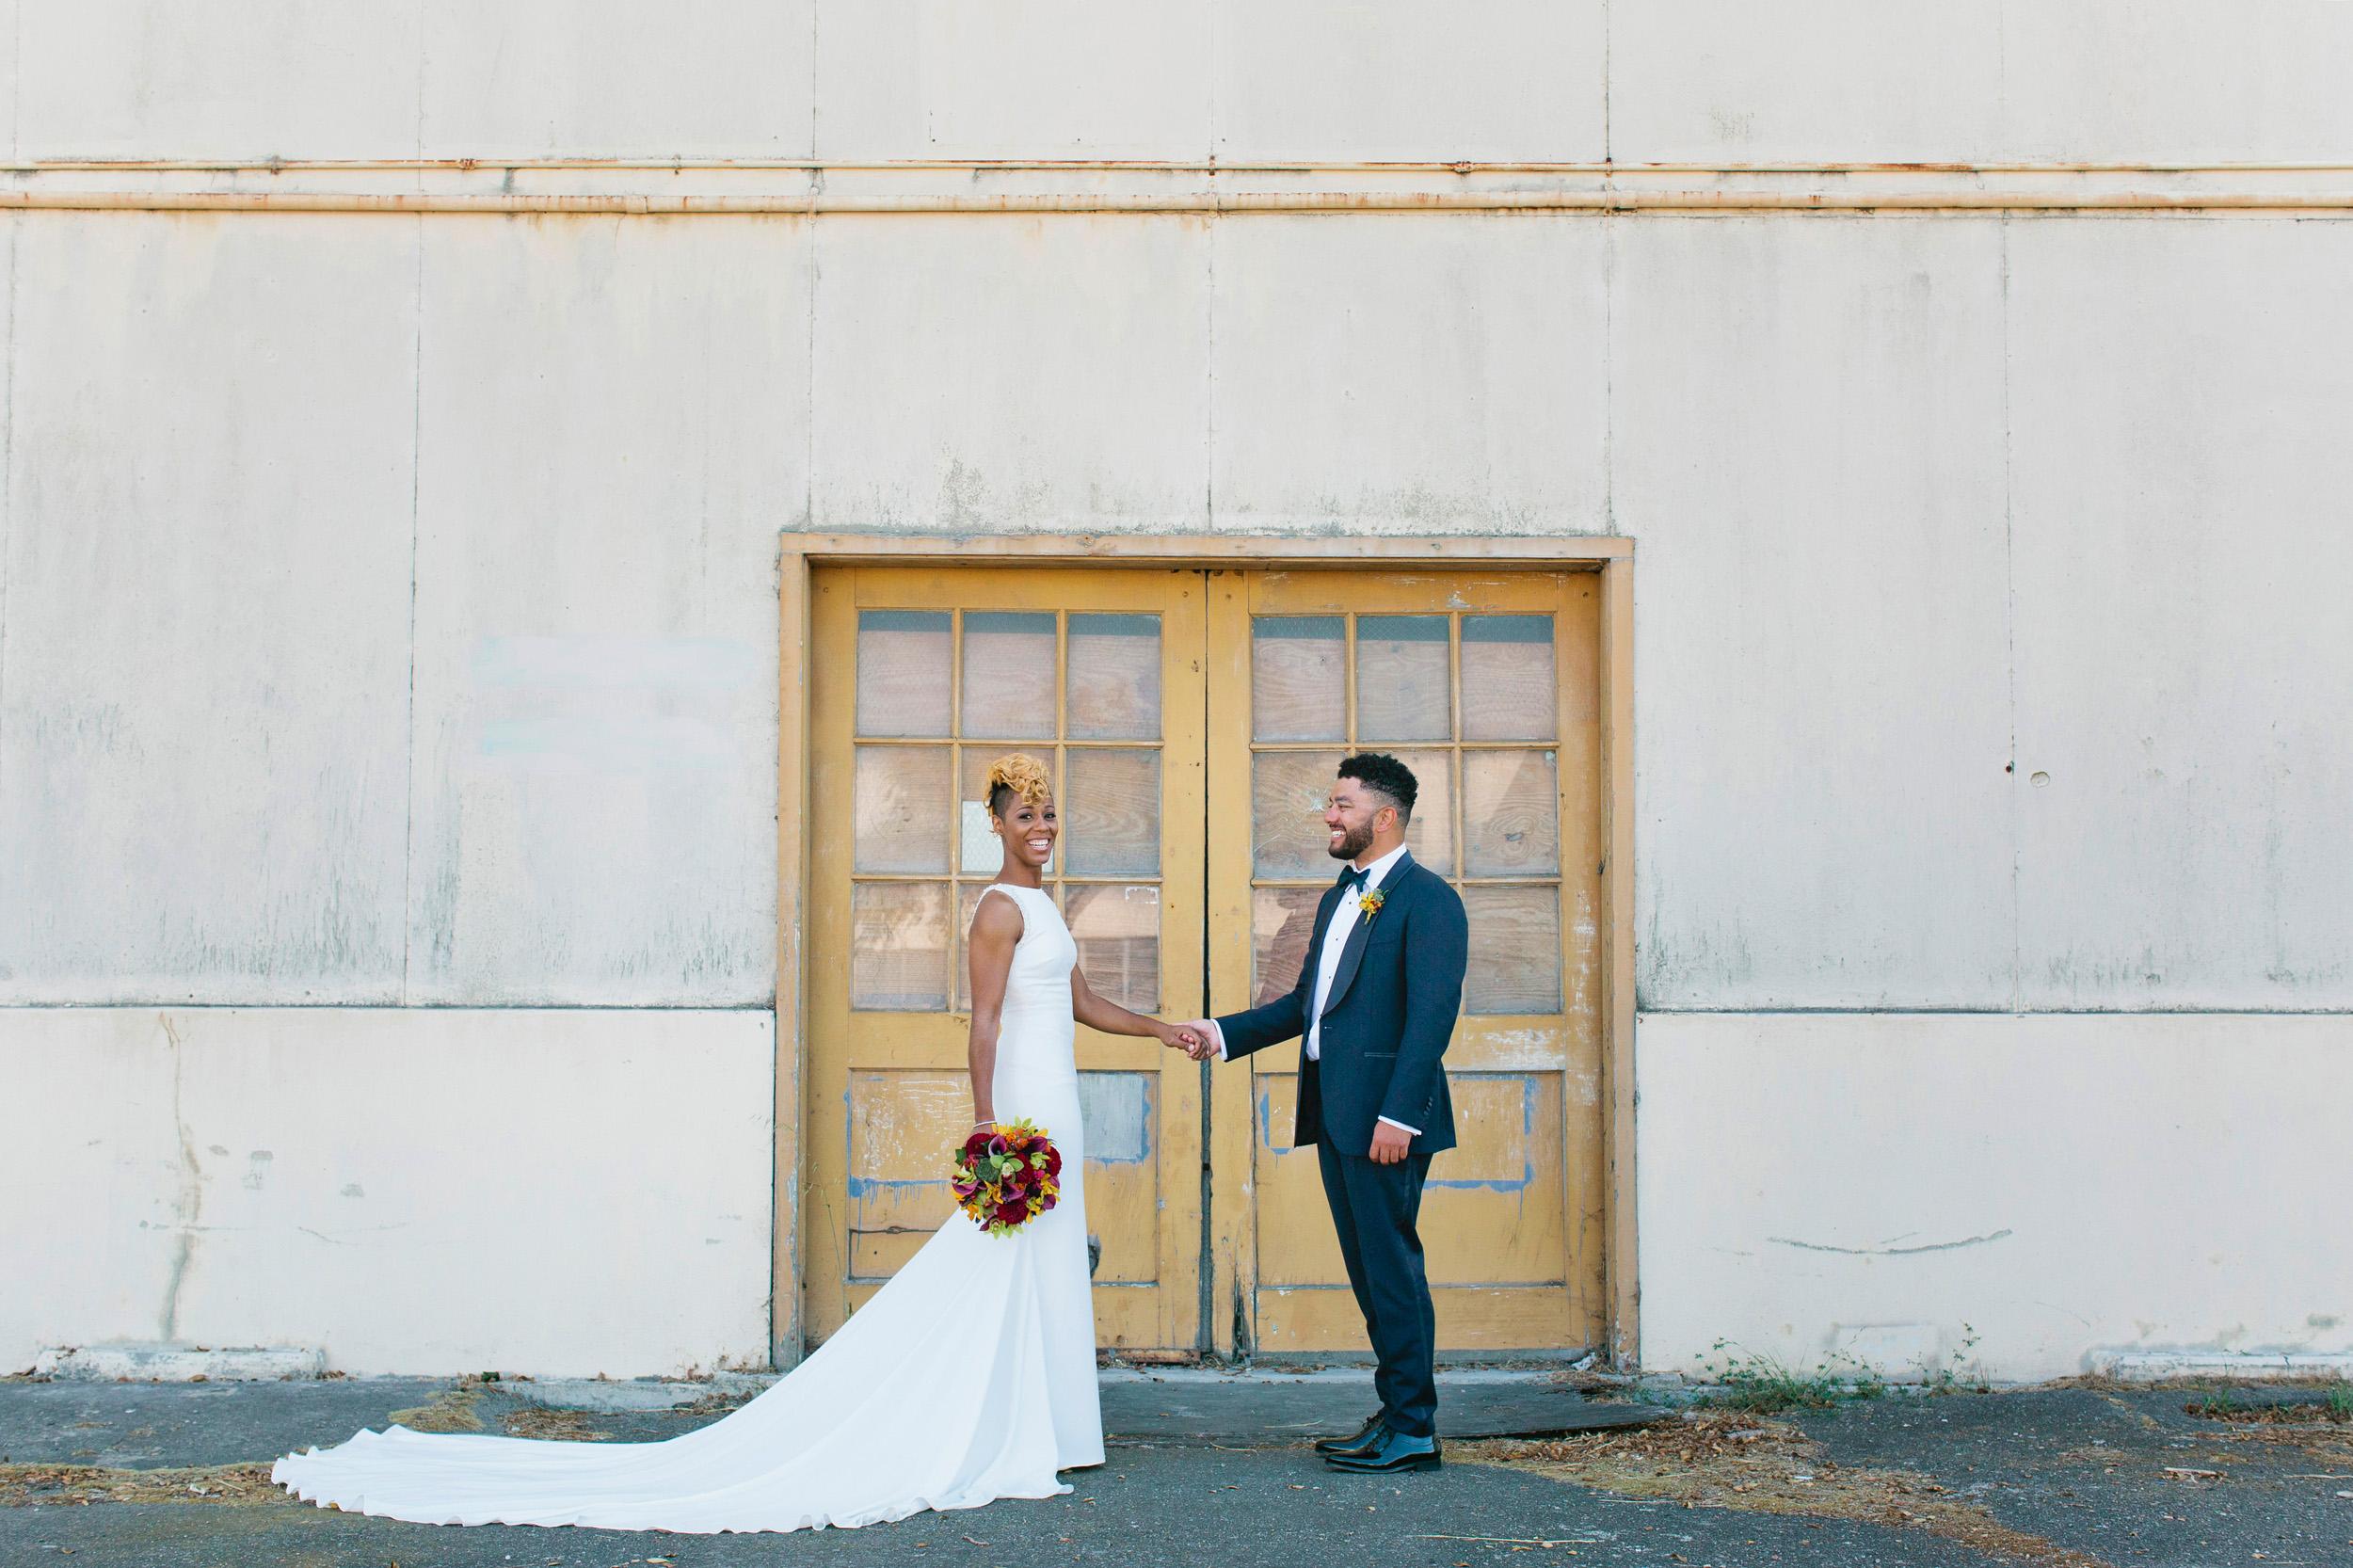 Alameda-Rockwall-Winery-Wedding-015.JPG